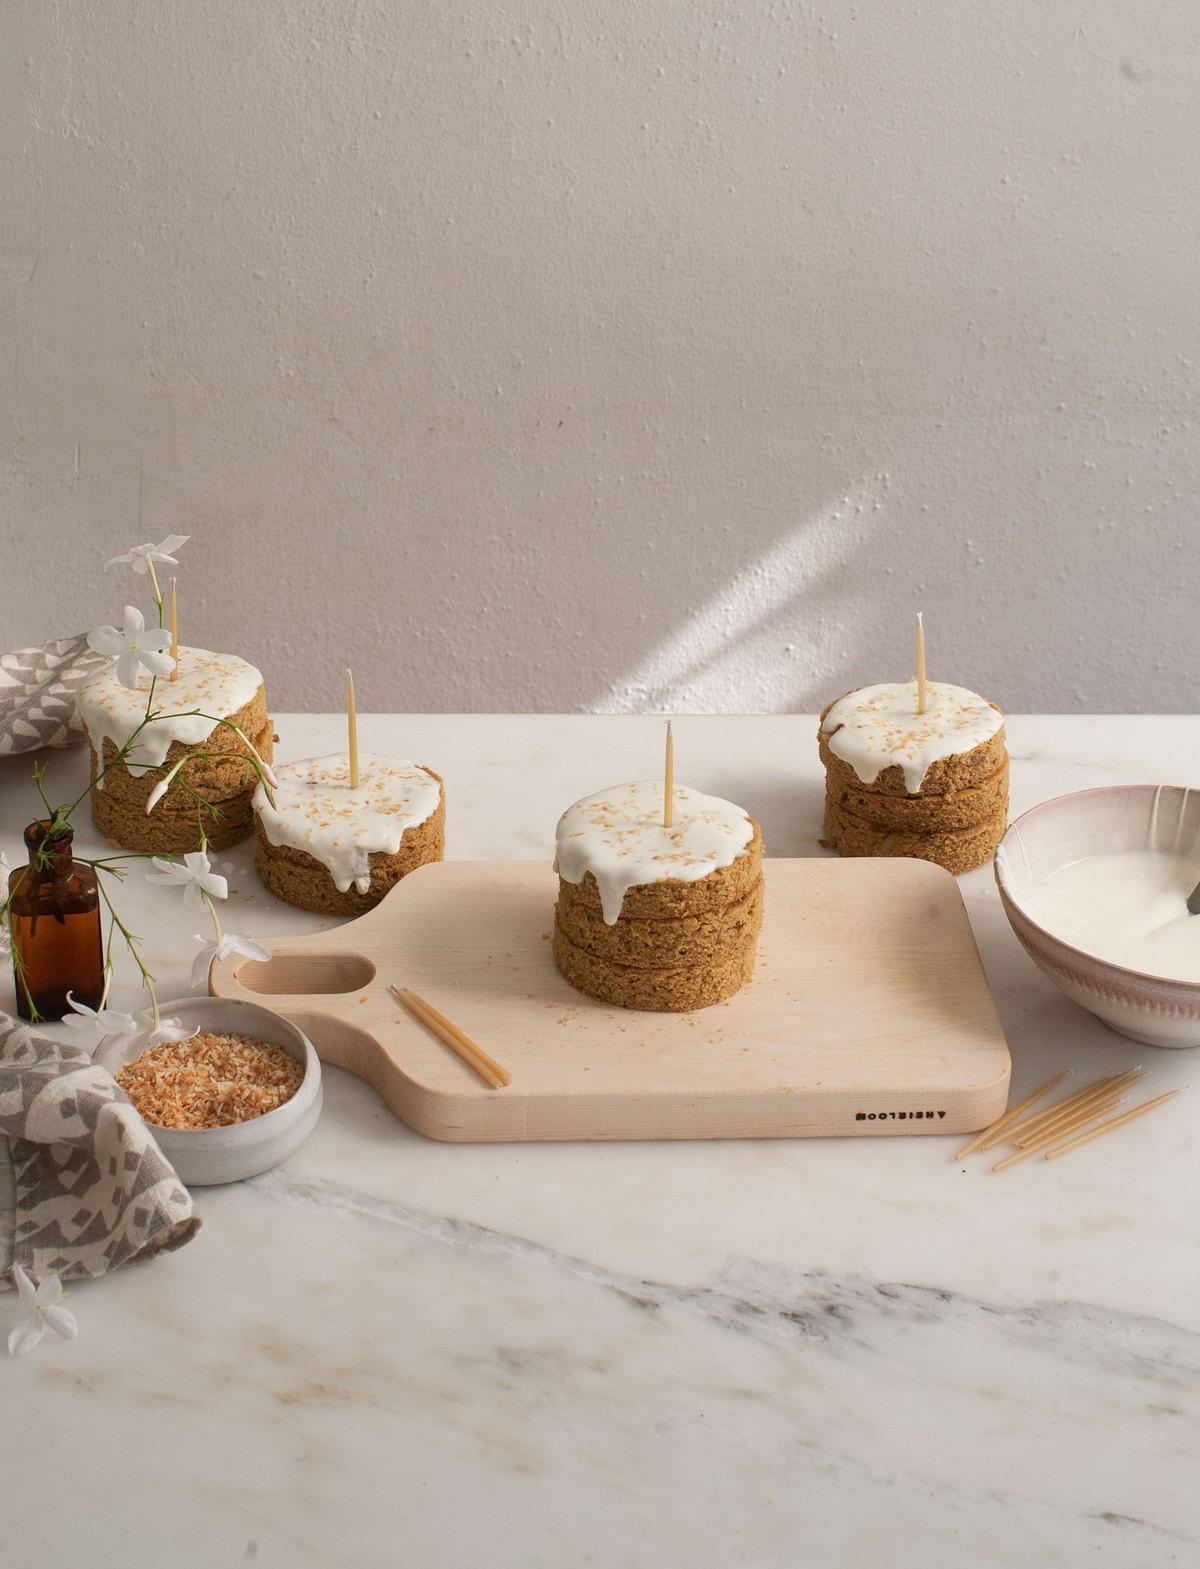 Grain Free Mini Dog Cakes For Amelia S Birthday A Cozy